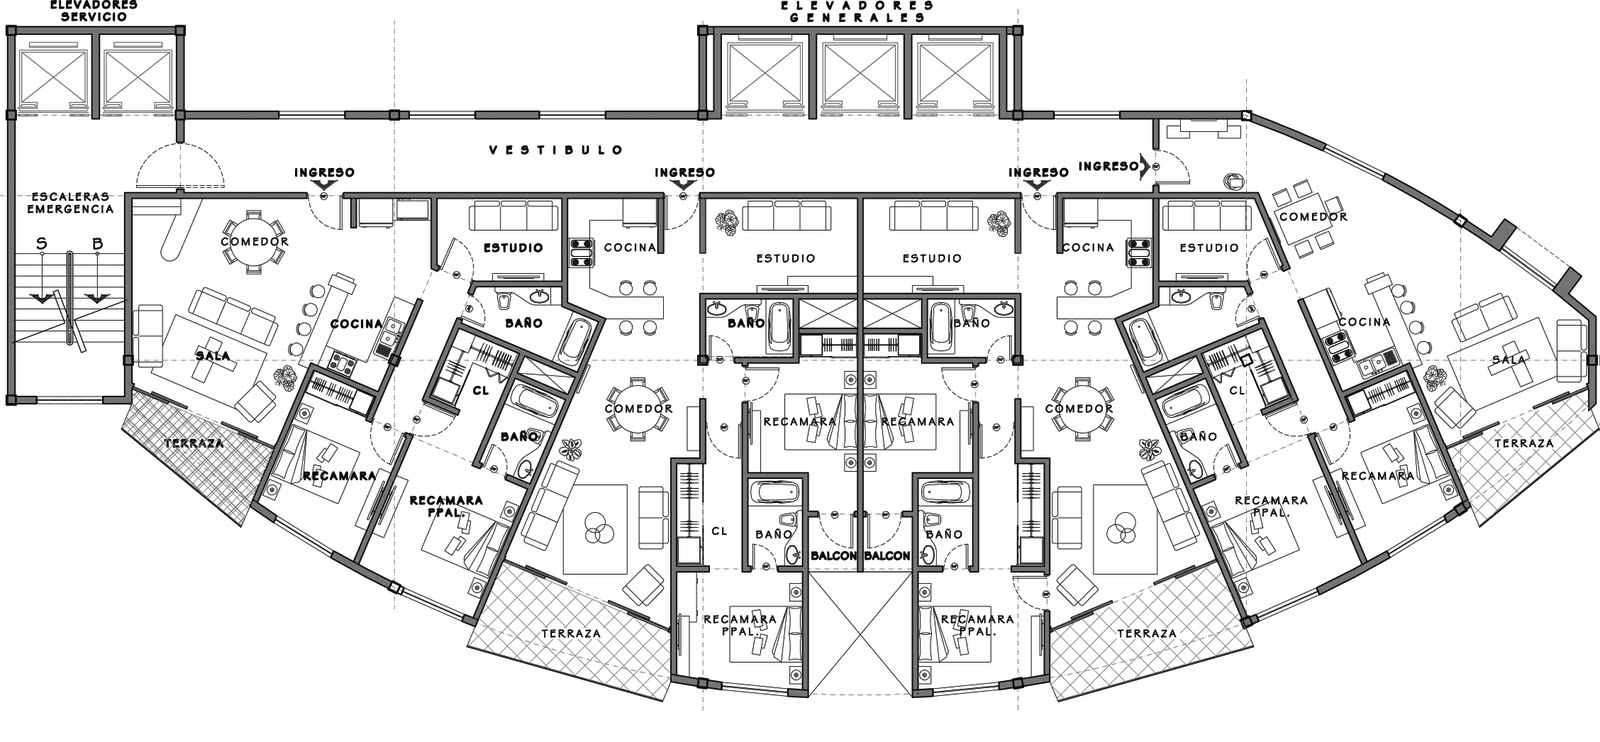 Edificio Residencial / Floor Plans for Residential Building